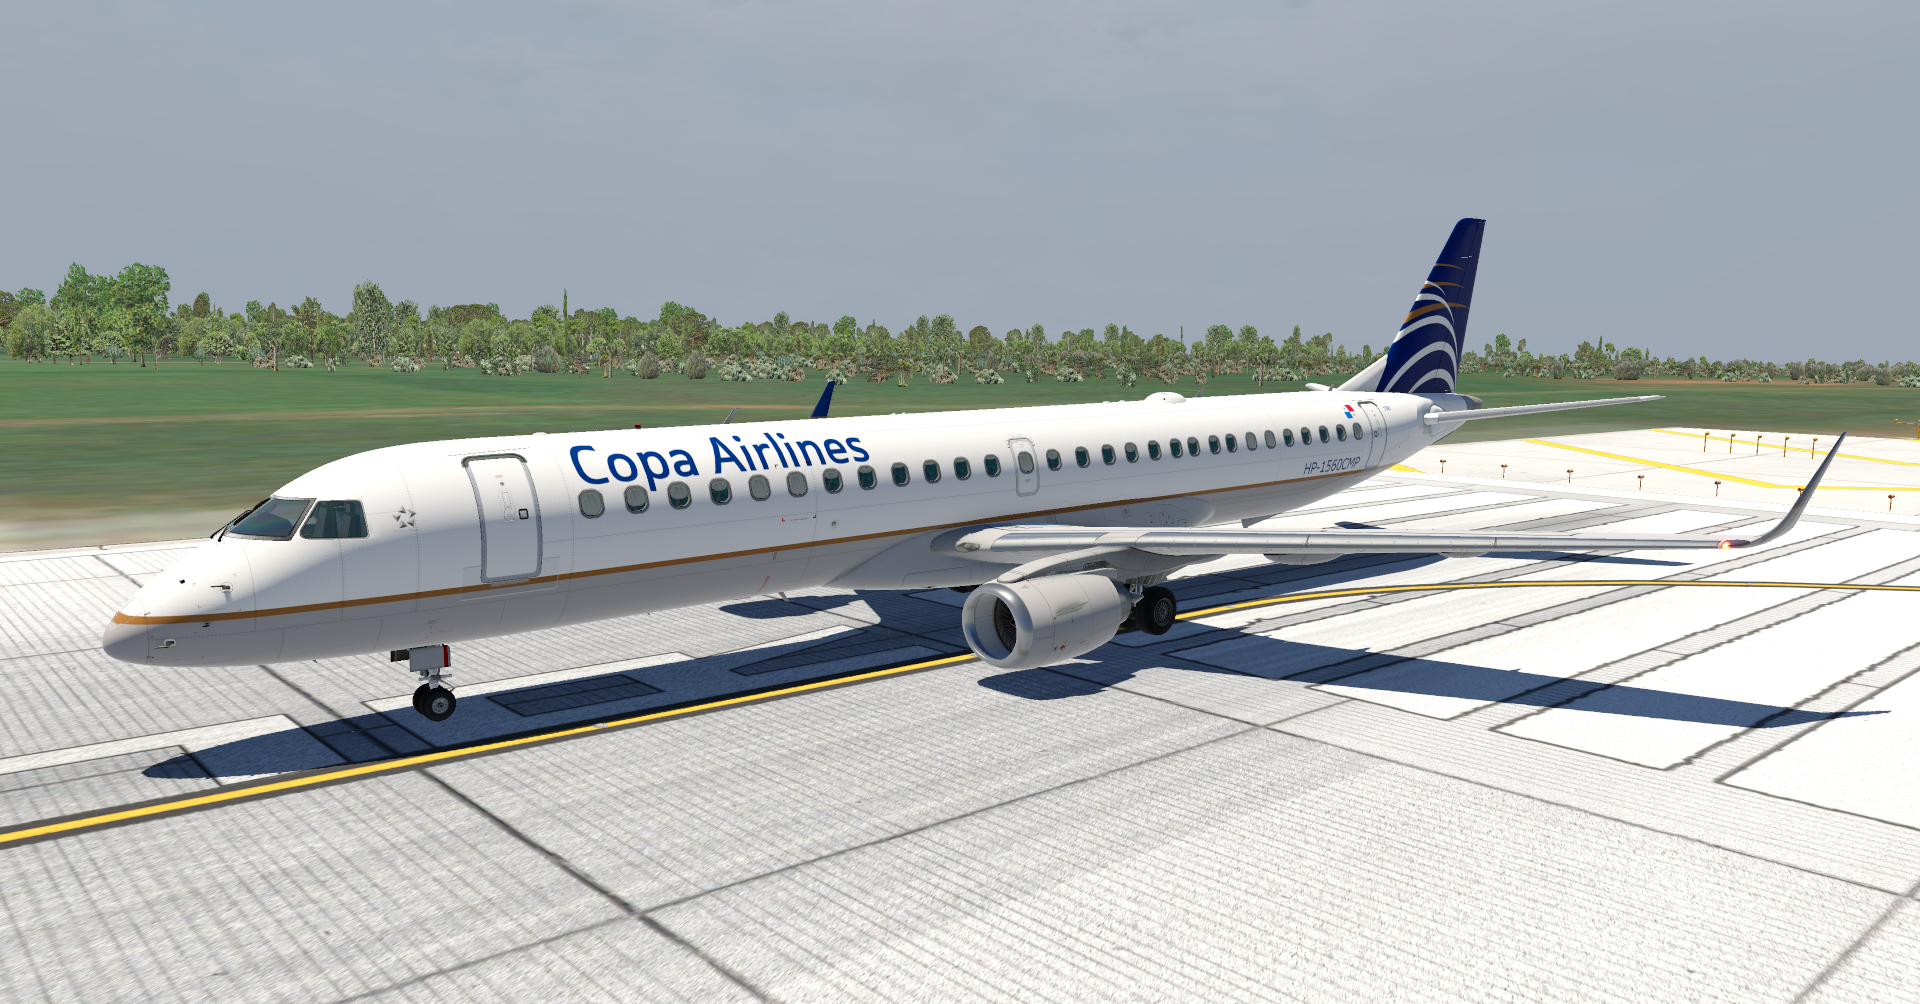 SSG E-195 Evolution - Copa Airlines - SSG Liveries - X-Plane Org Forum